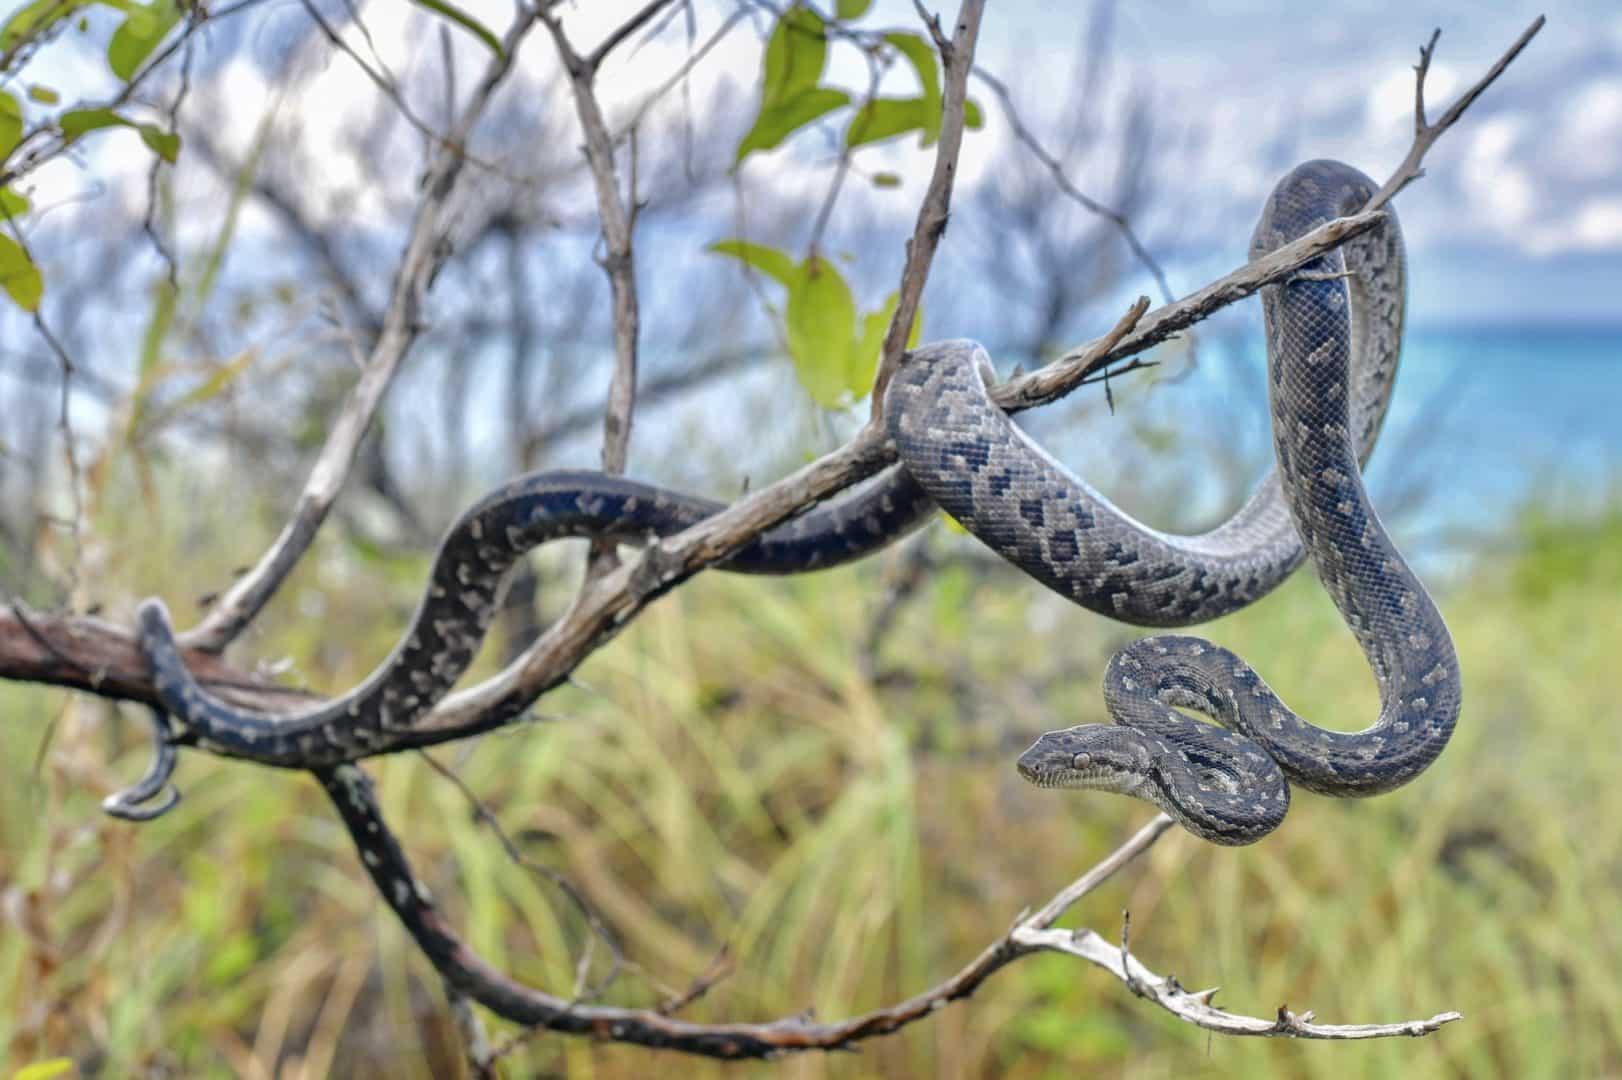 Tipos de cobras - características e principais diferenças entre espécies